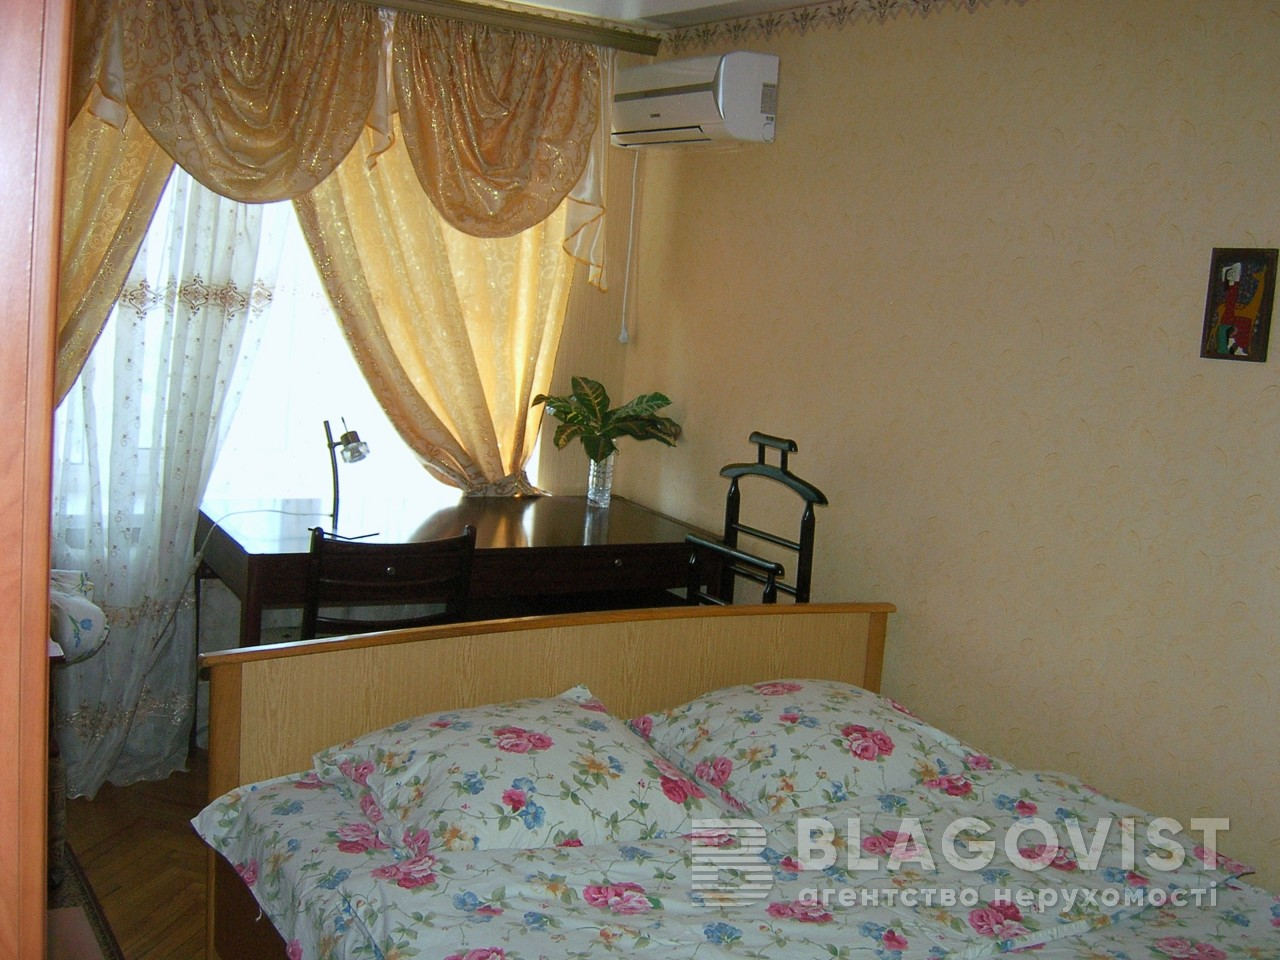 Квартира C-43056, Леси Украинки бульв., 9, Киев - Фото 7